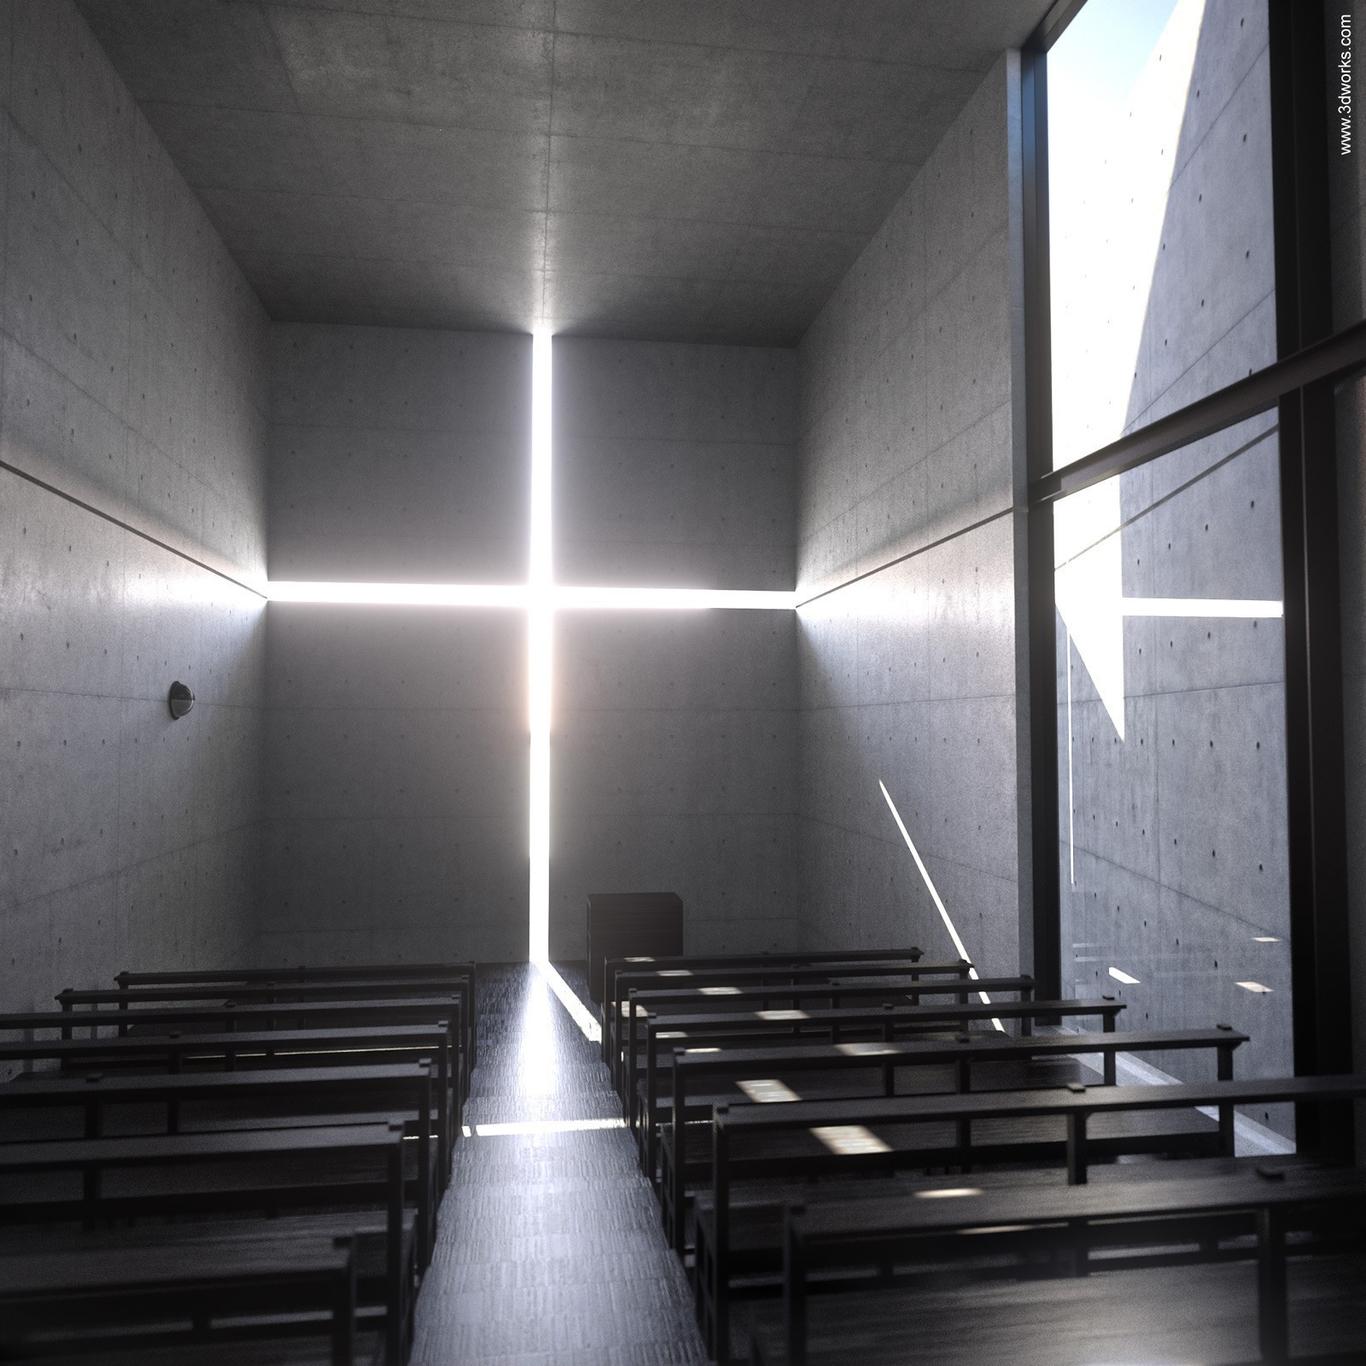 Threedeworks tadao ando church in 1 05cebe5d hw1s